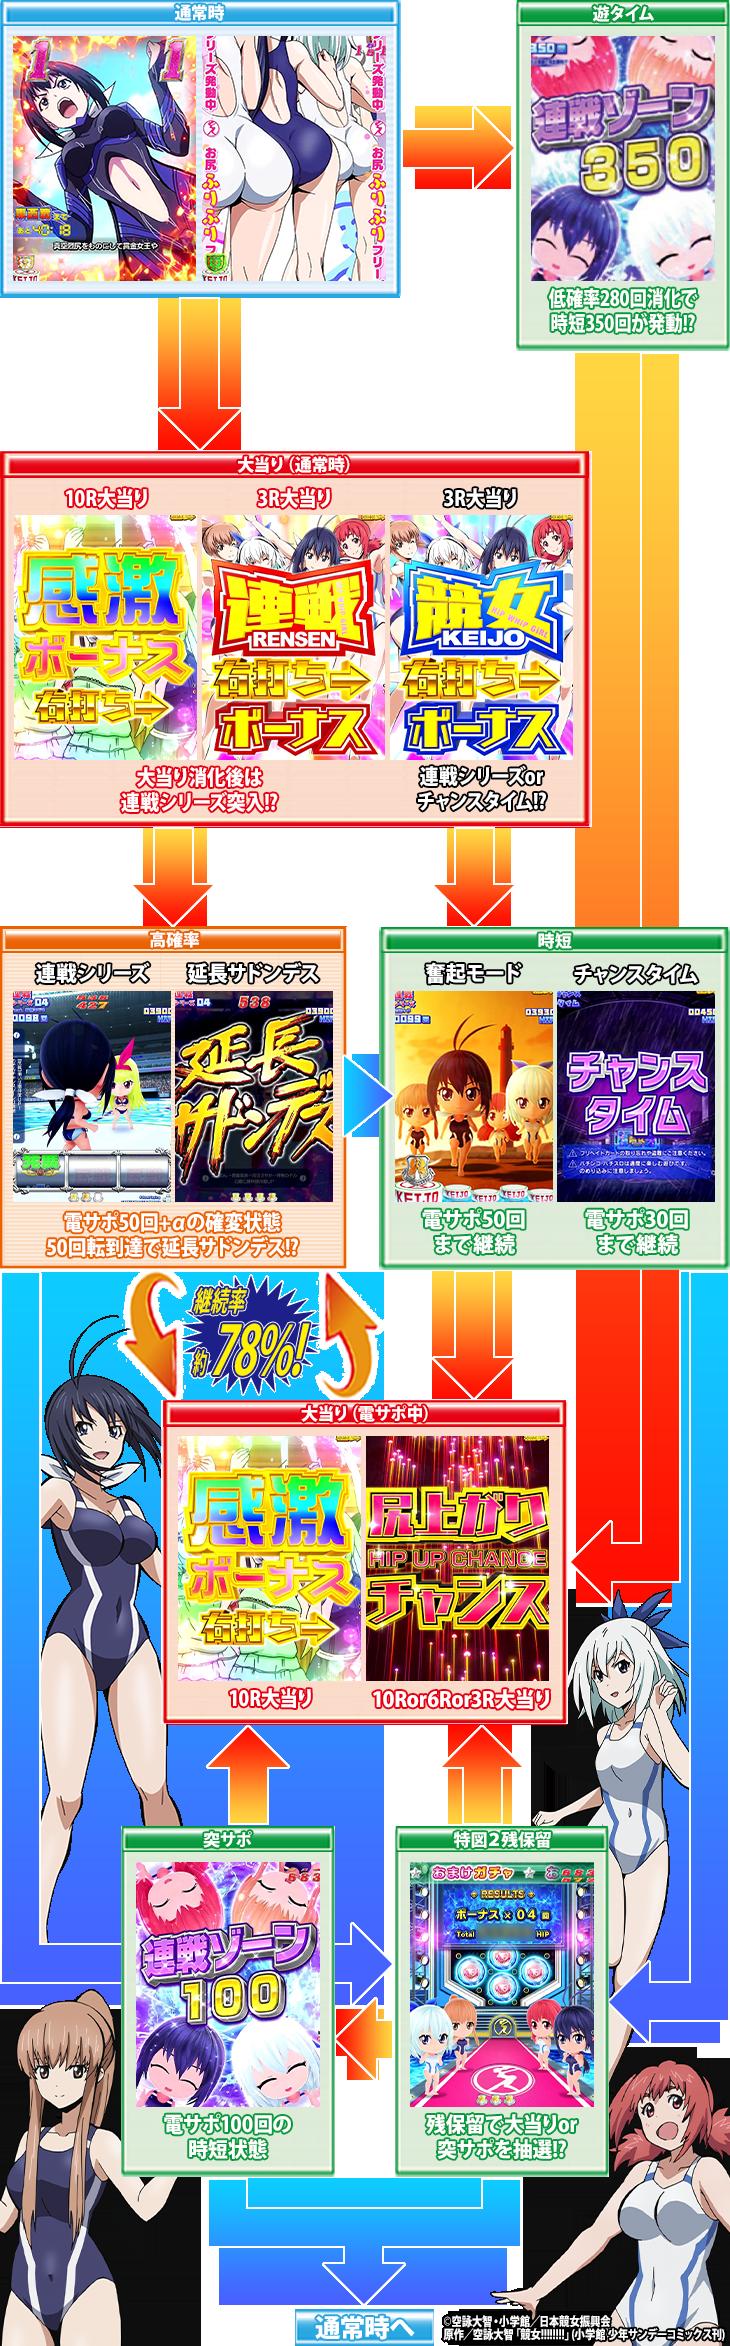 PA競女!!!!!!!!-KEIJO-99Ver.のゲームフロー